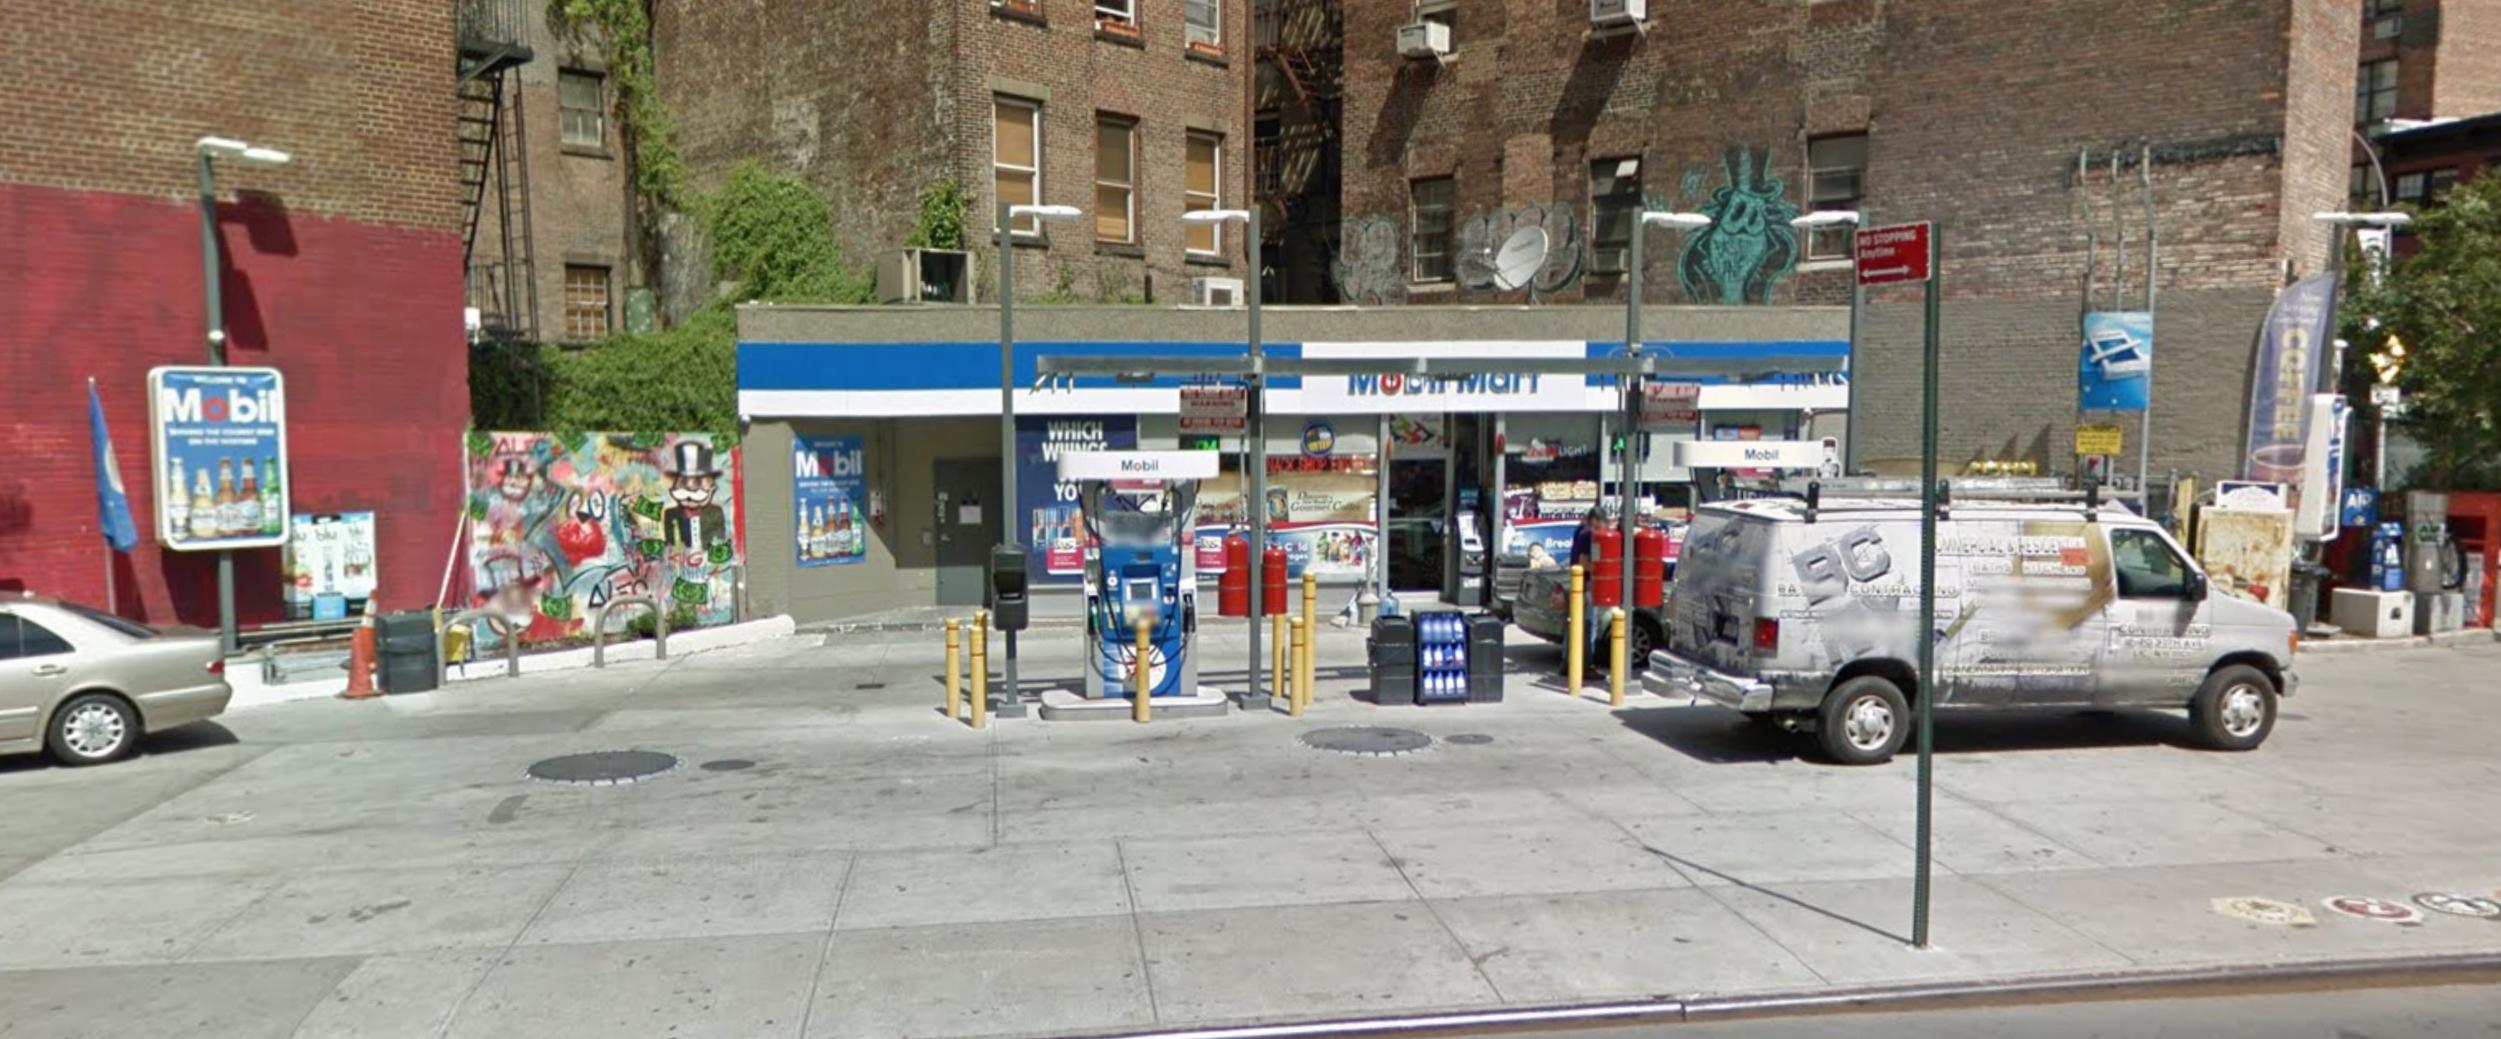 51-63 Eighth Avenue in June of 2016. Via Google Maps.